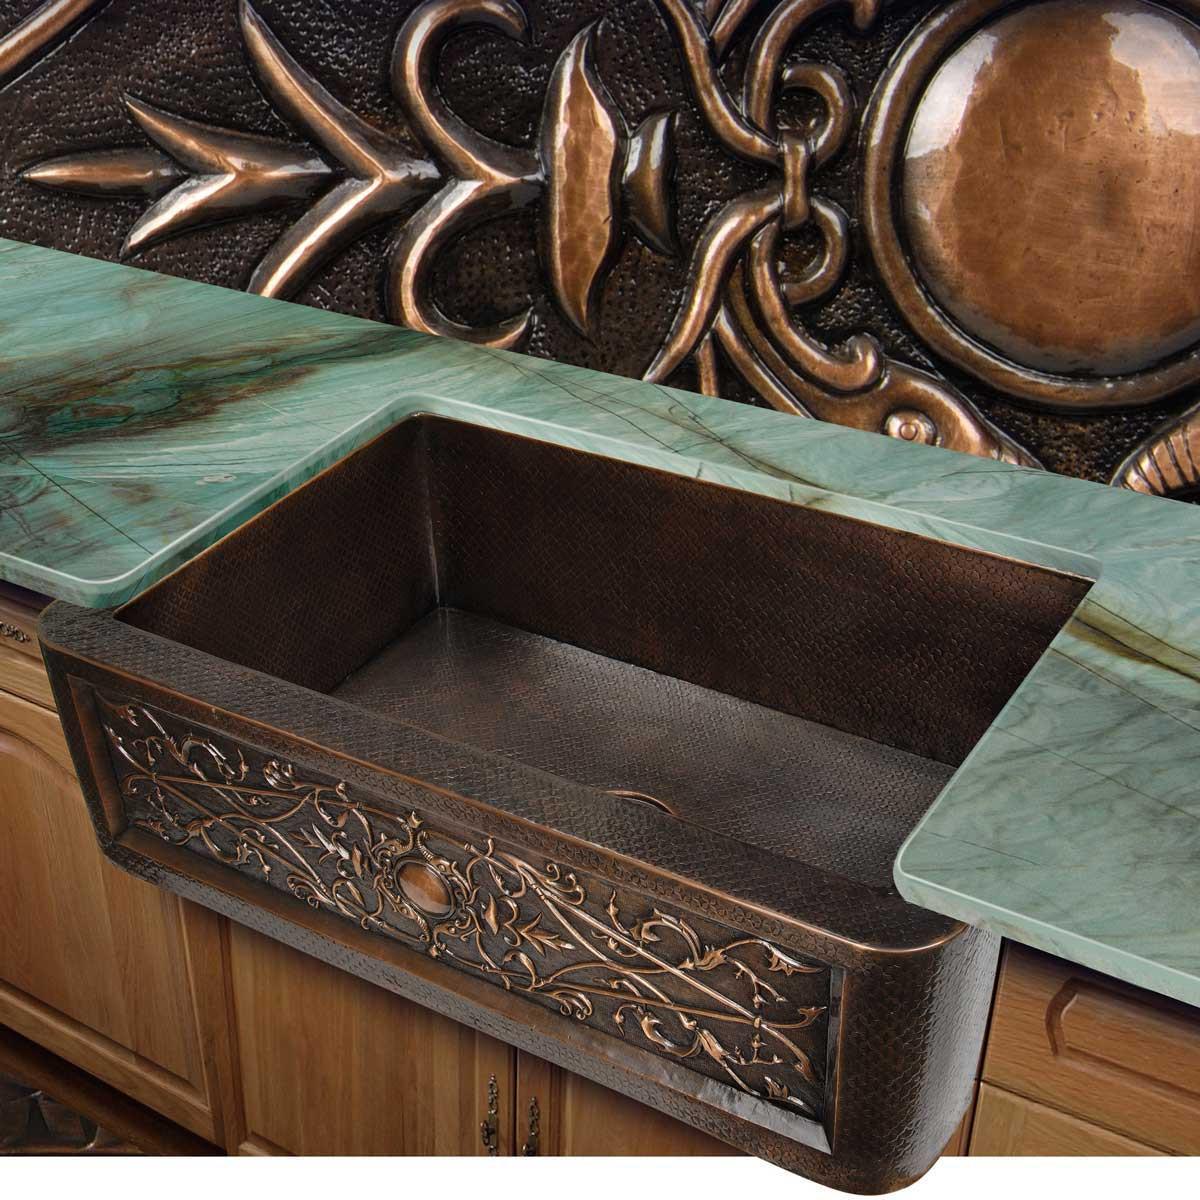 KPAD3322D10 Artisan Copper counter